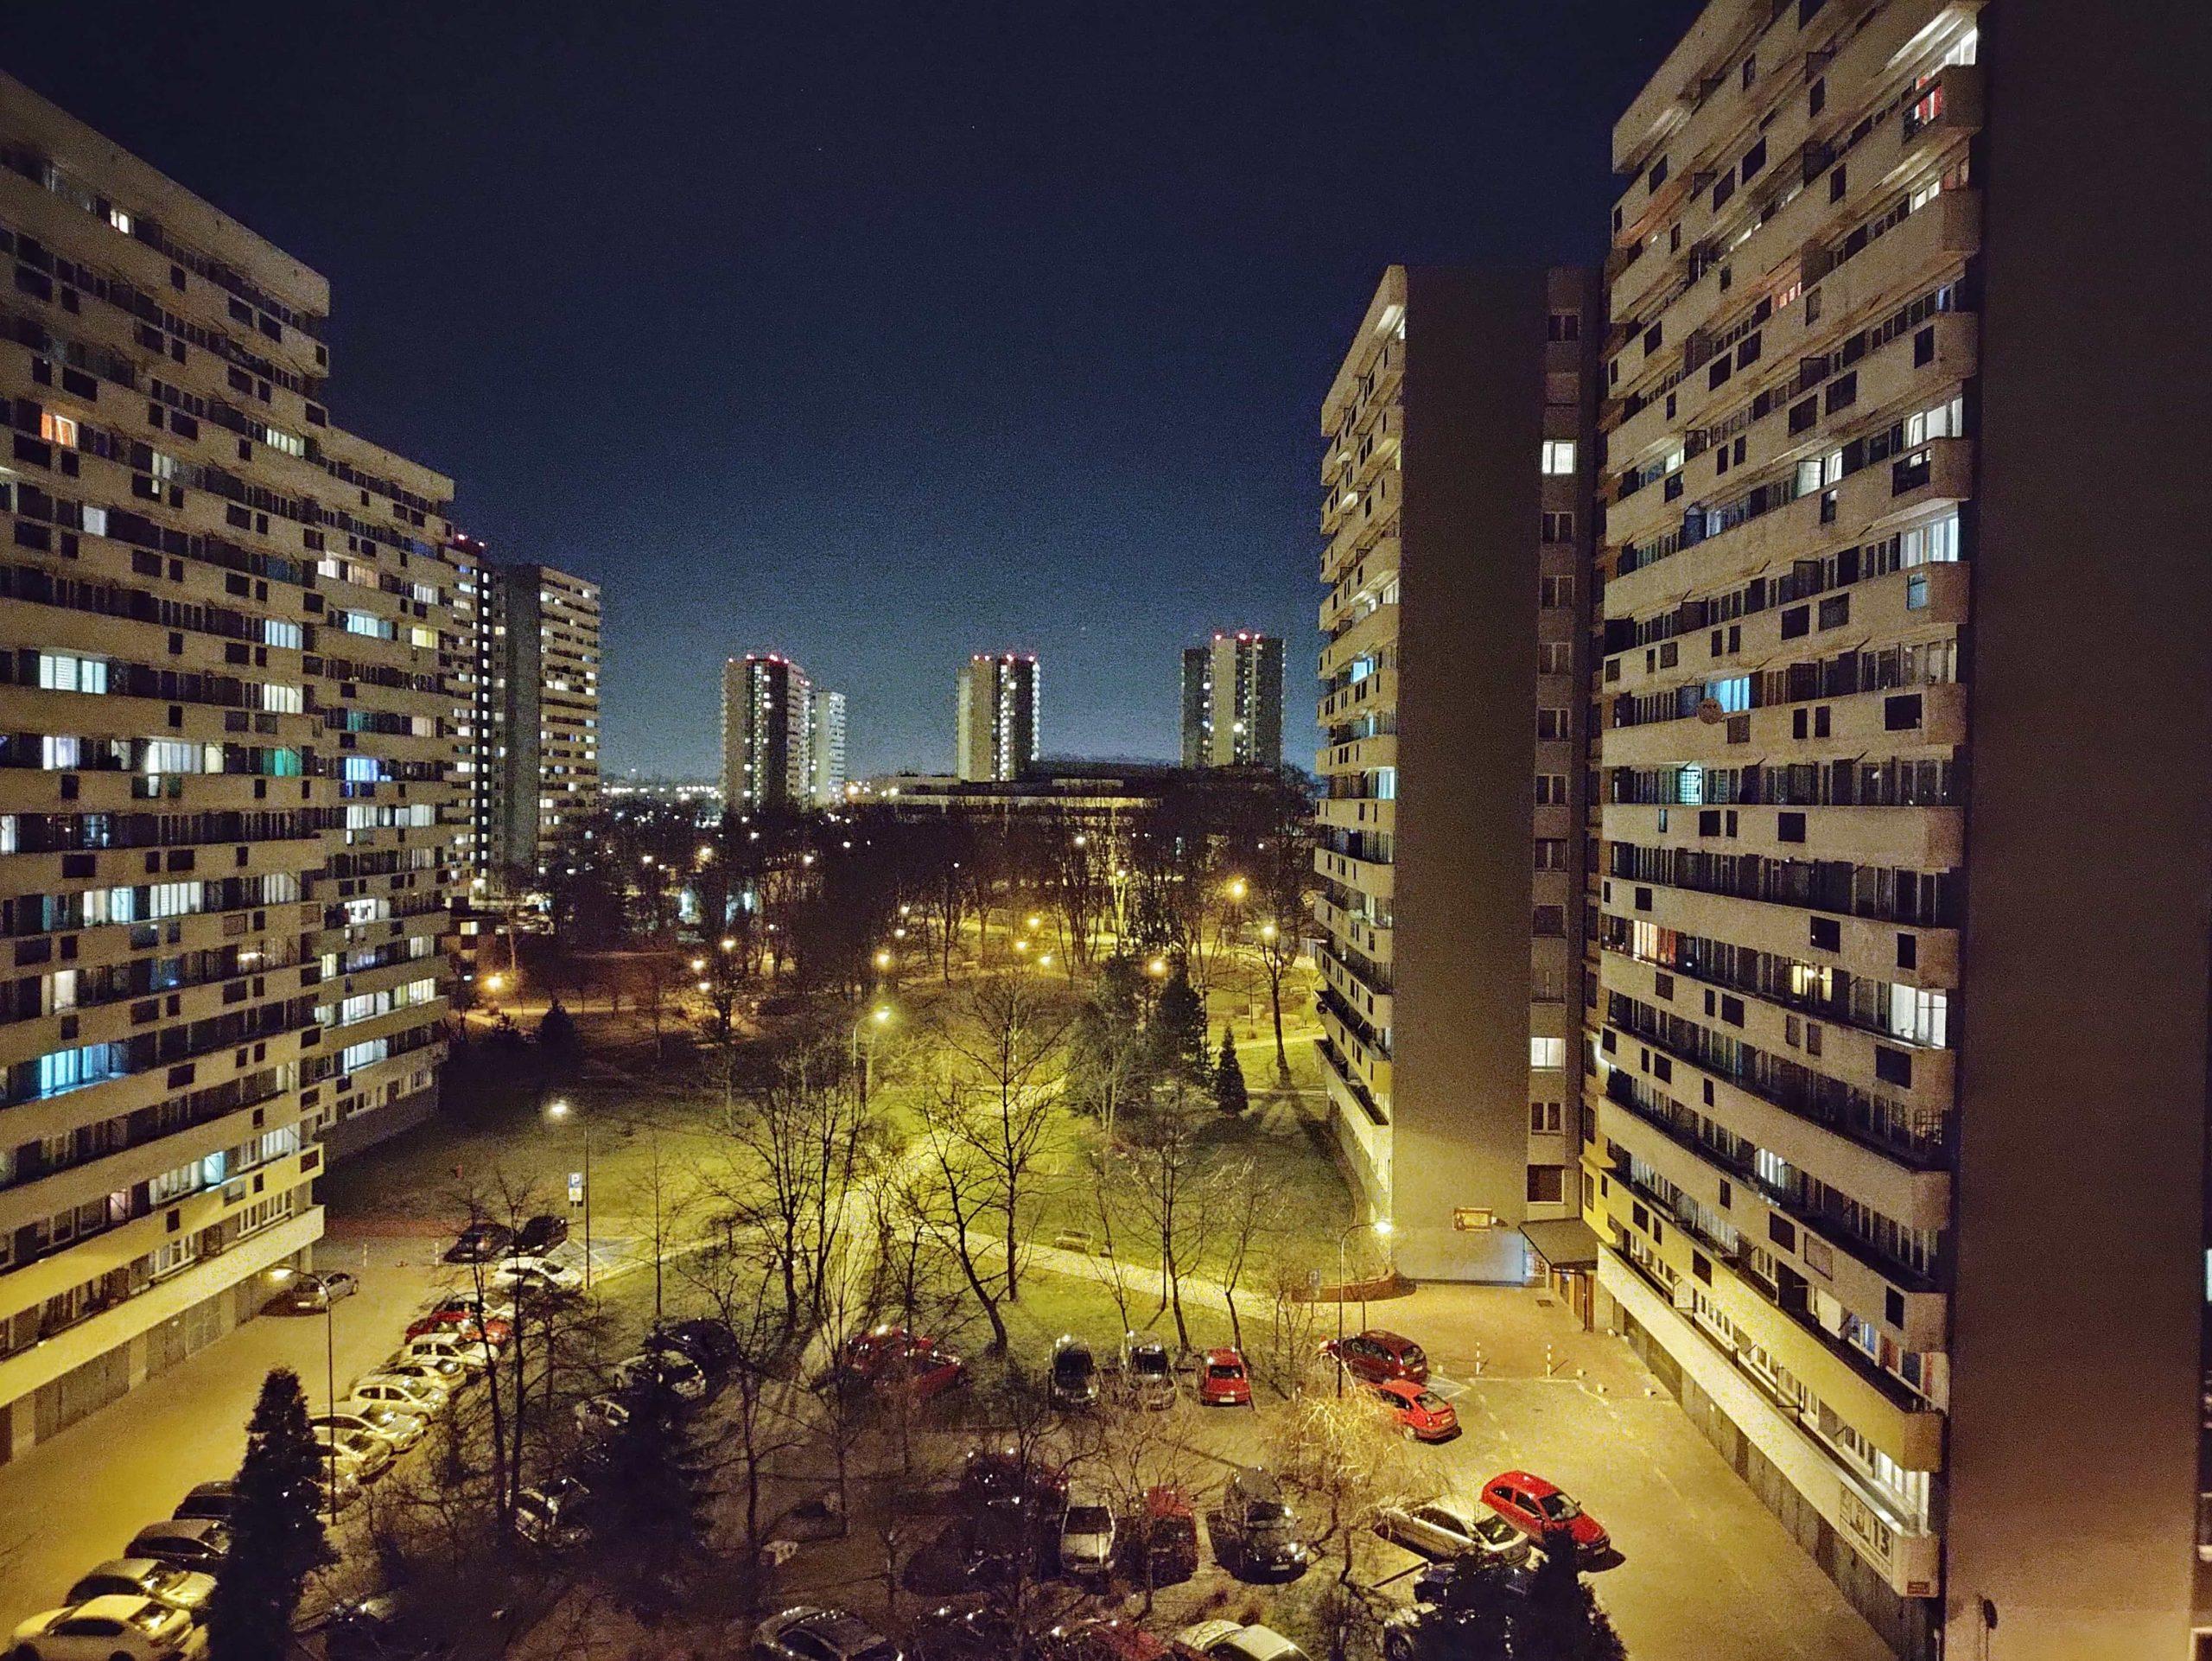 Zdjęcia nocne - Motorola Moto G100